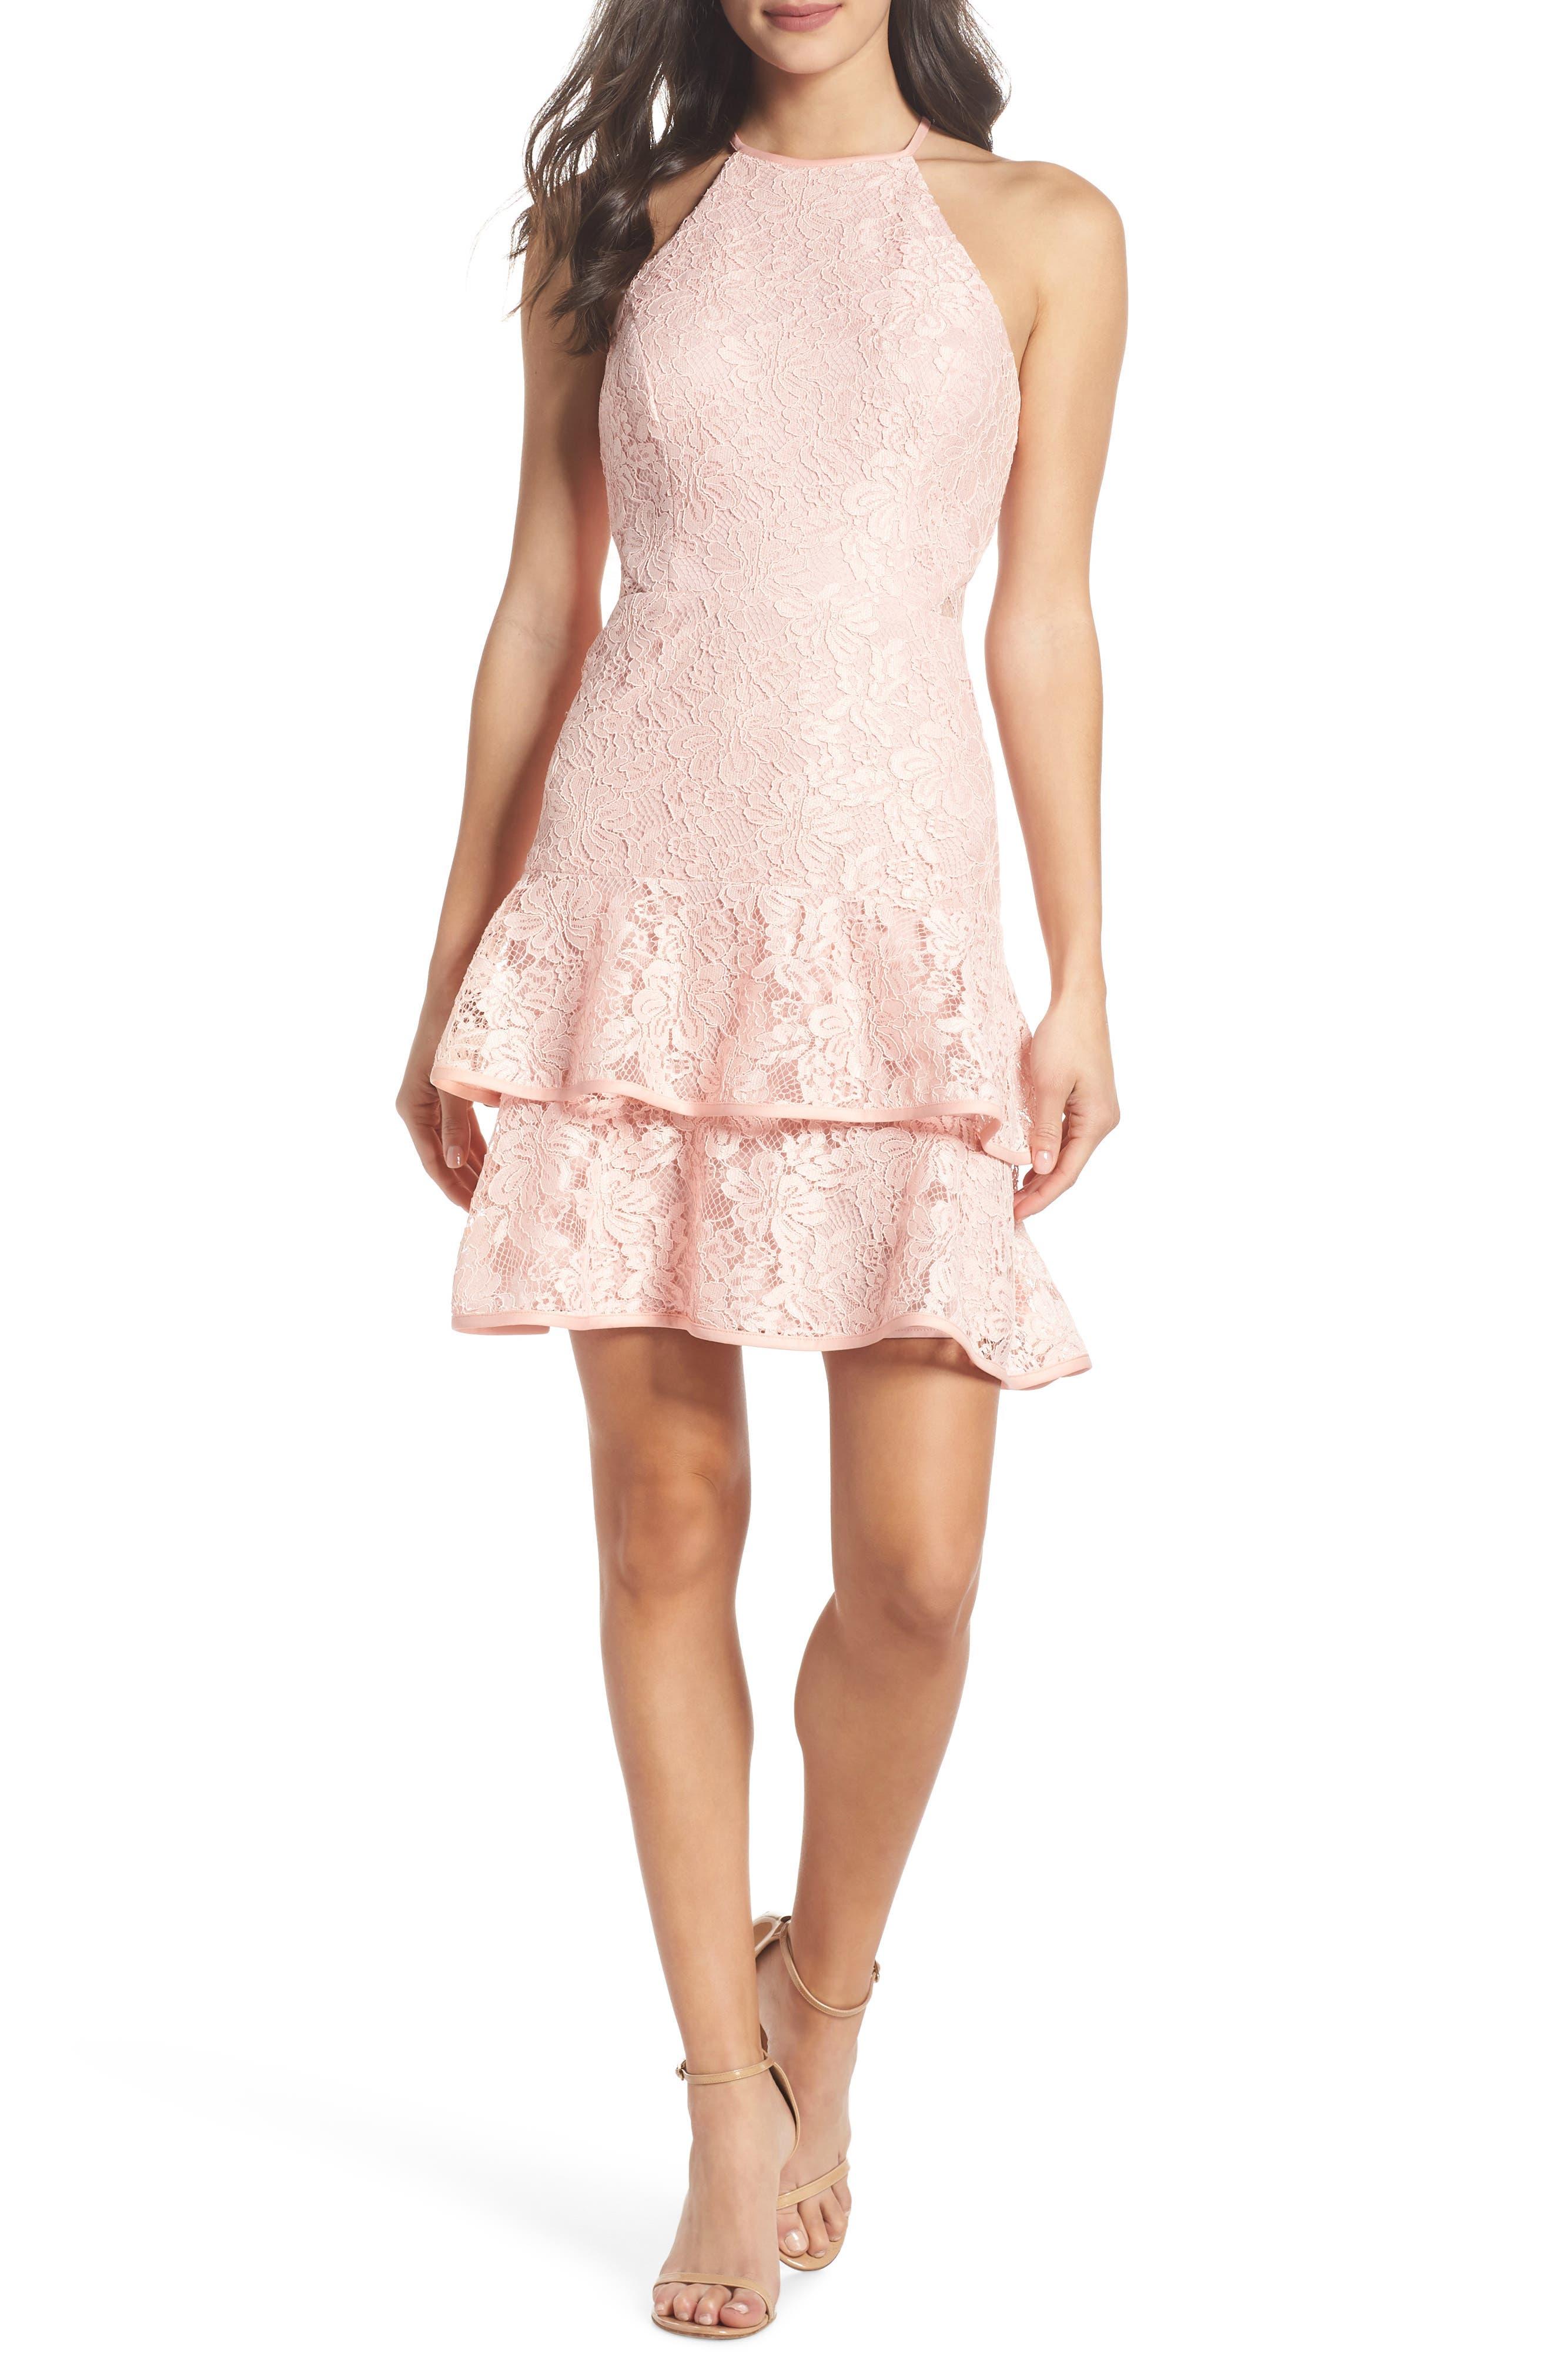 Ruffle Tier Lace Party Dress,                             Main thumbnail 1, color,                             Blush